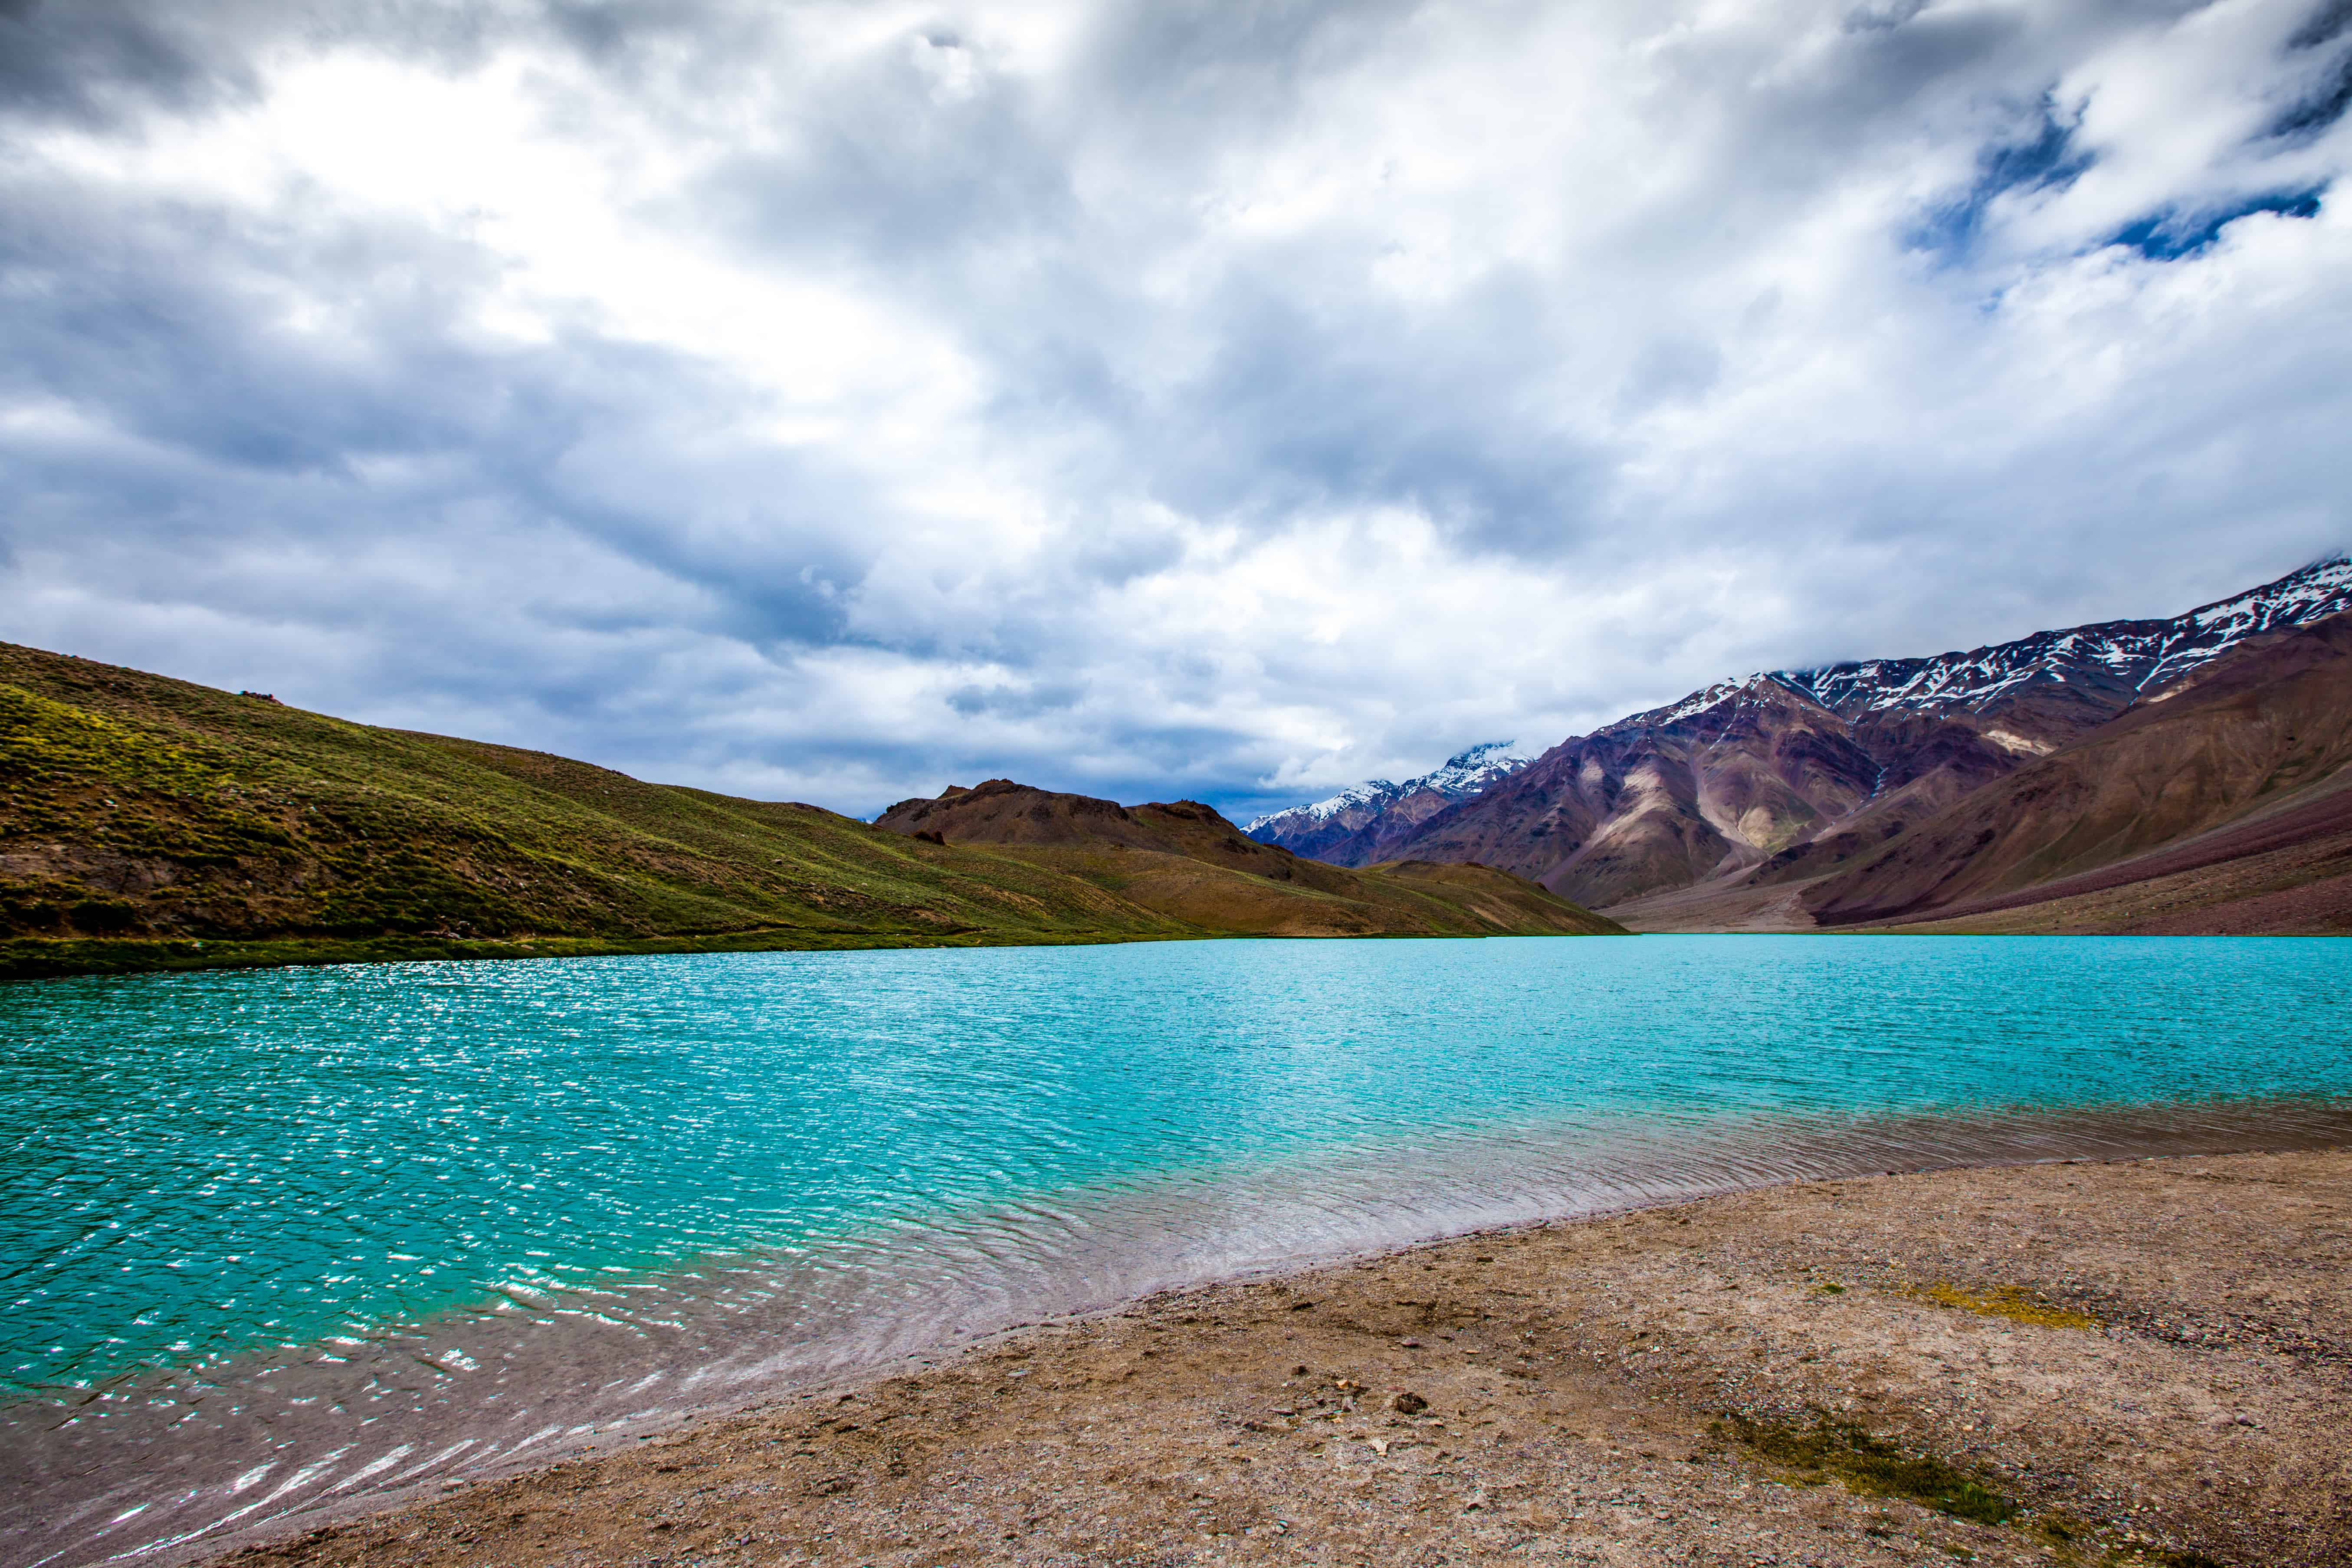 Chandratal Lake Spiti Valley Lahul And Spiti Himachal Pradesh (India)